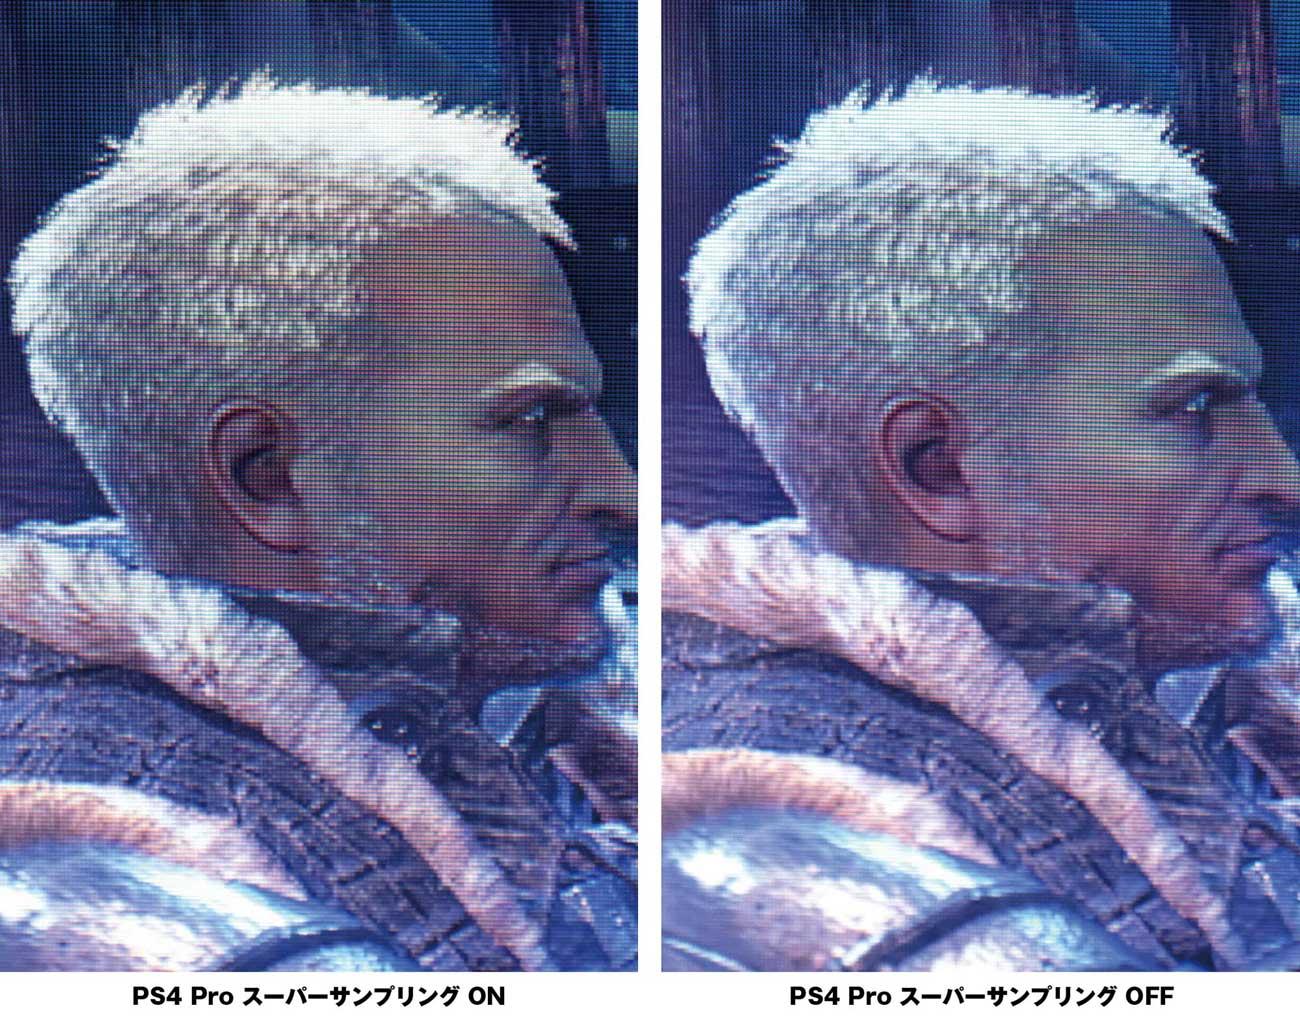 PS4 Pro スーパーサンプリング テレビ撮影